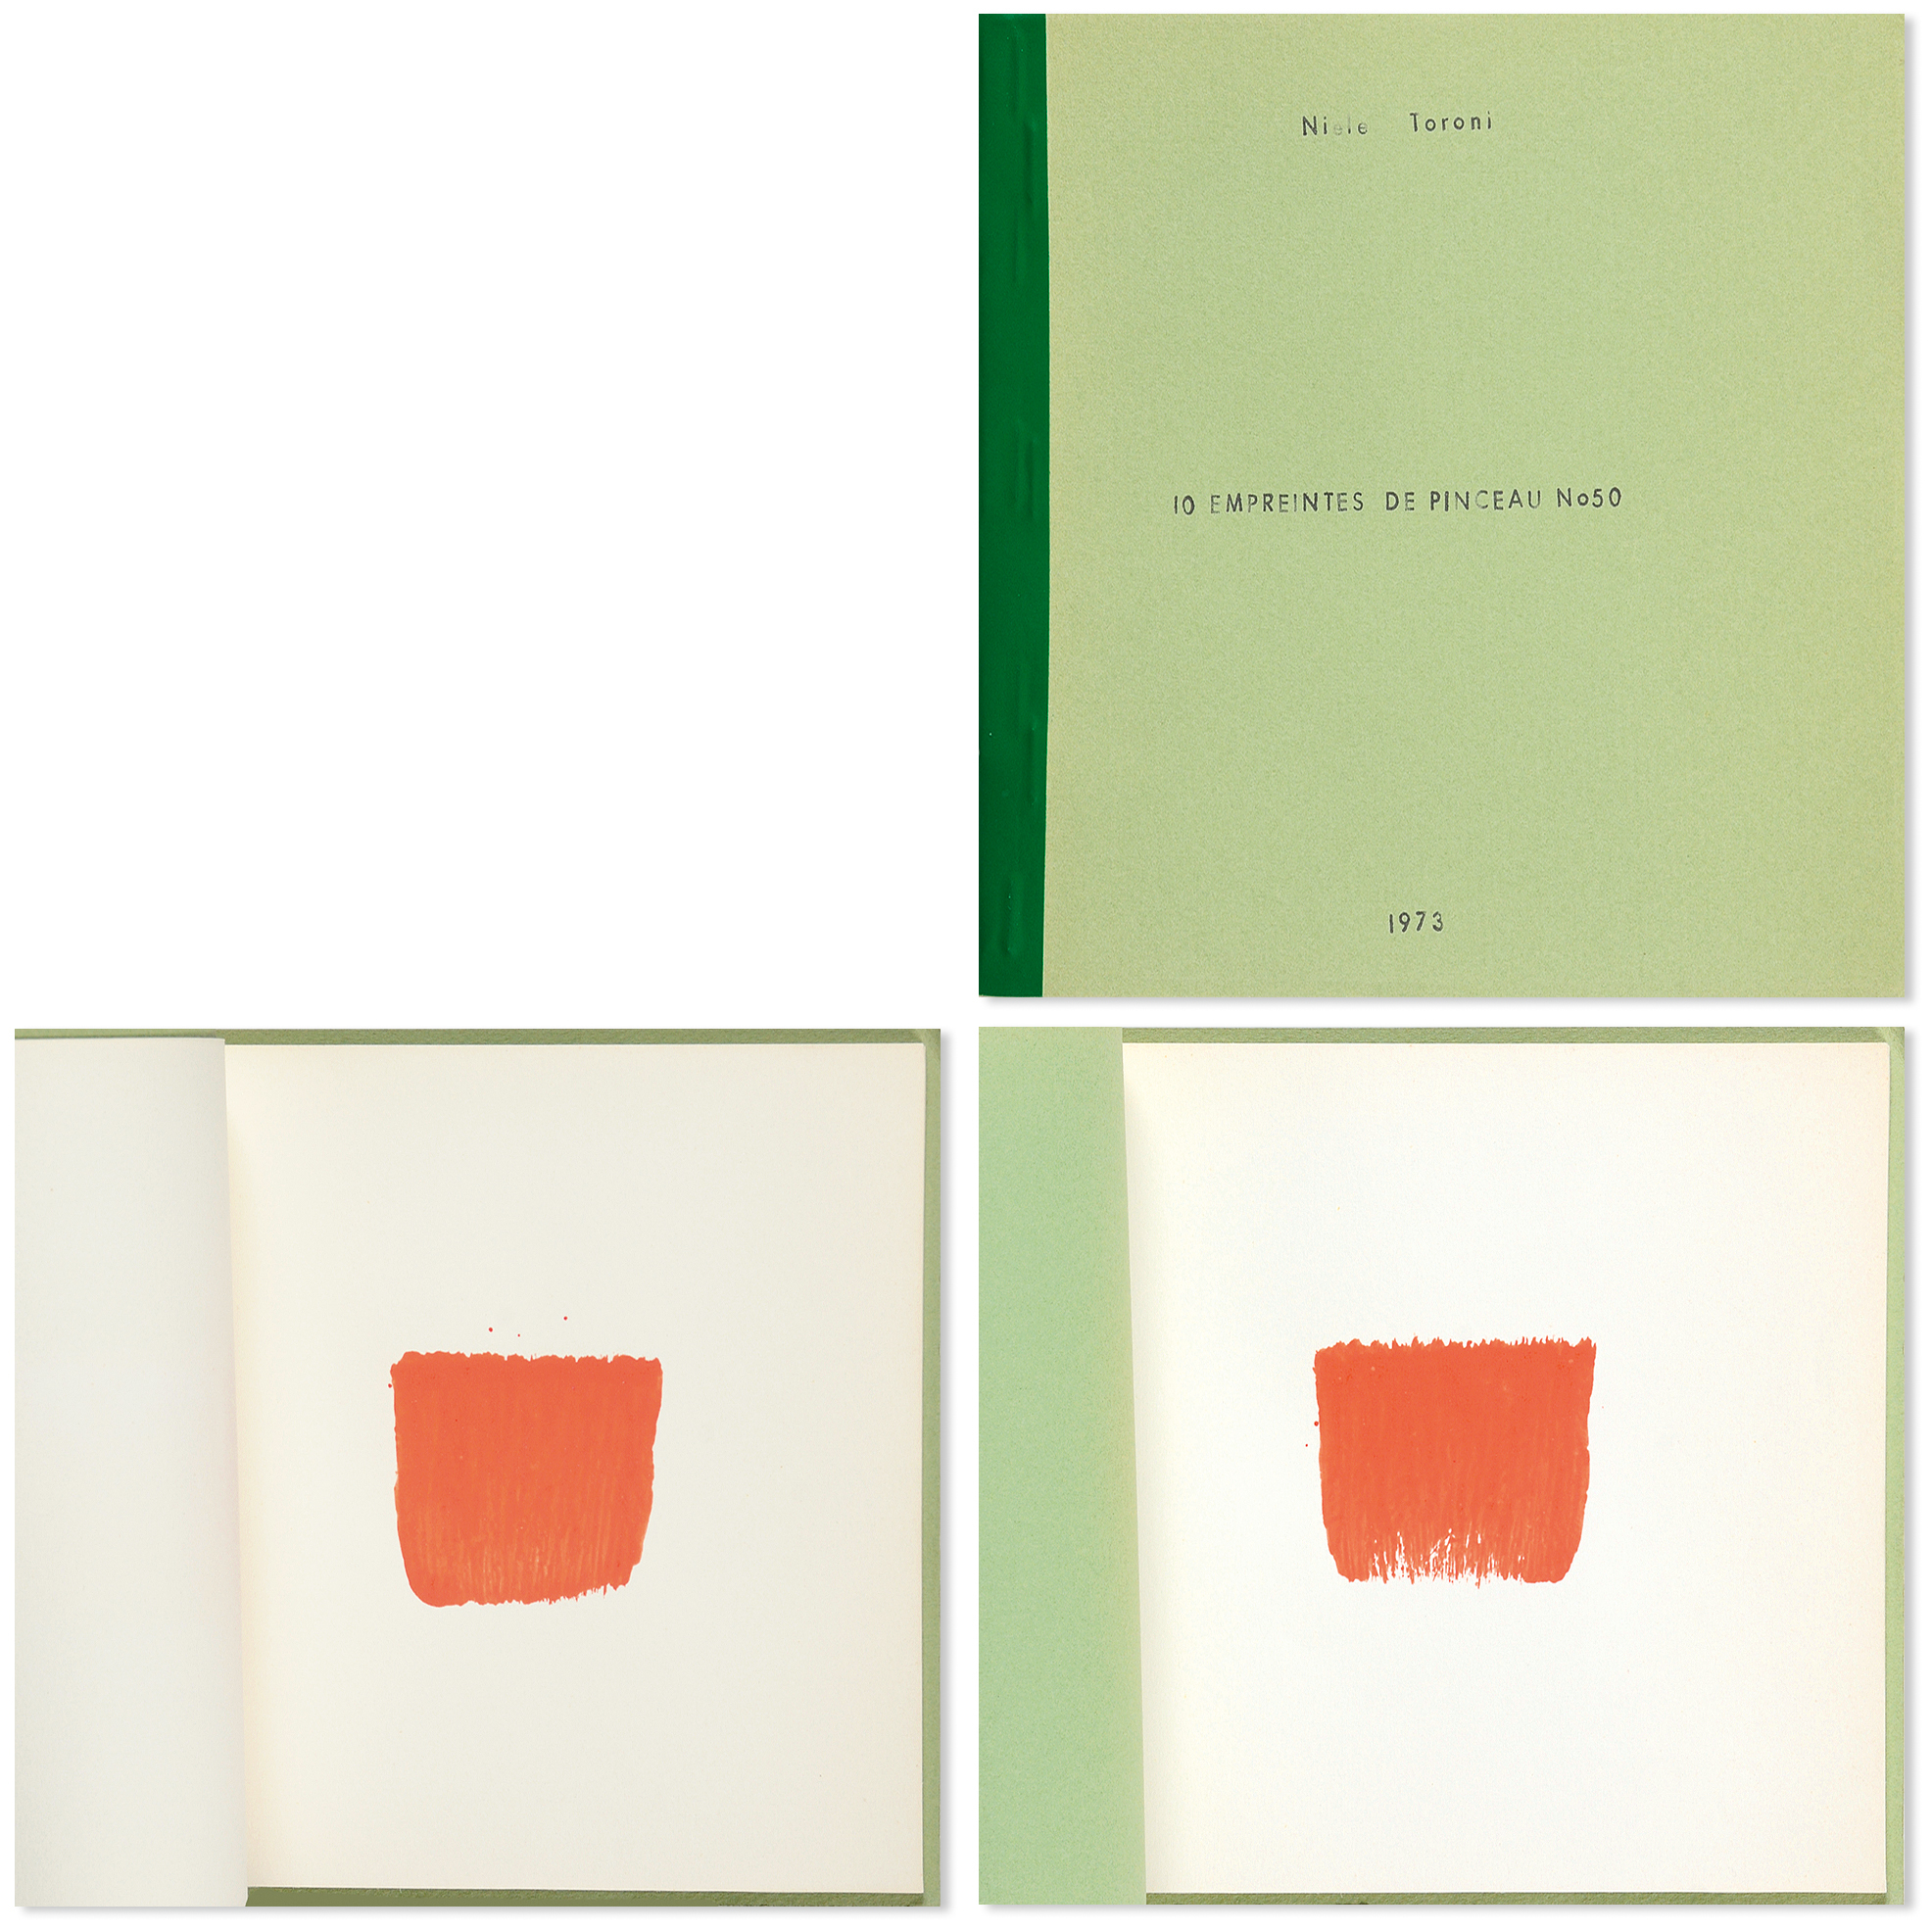 Toroni Niele, 10 empreintes de pinceau No 50